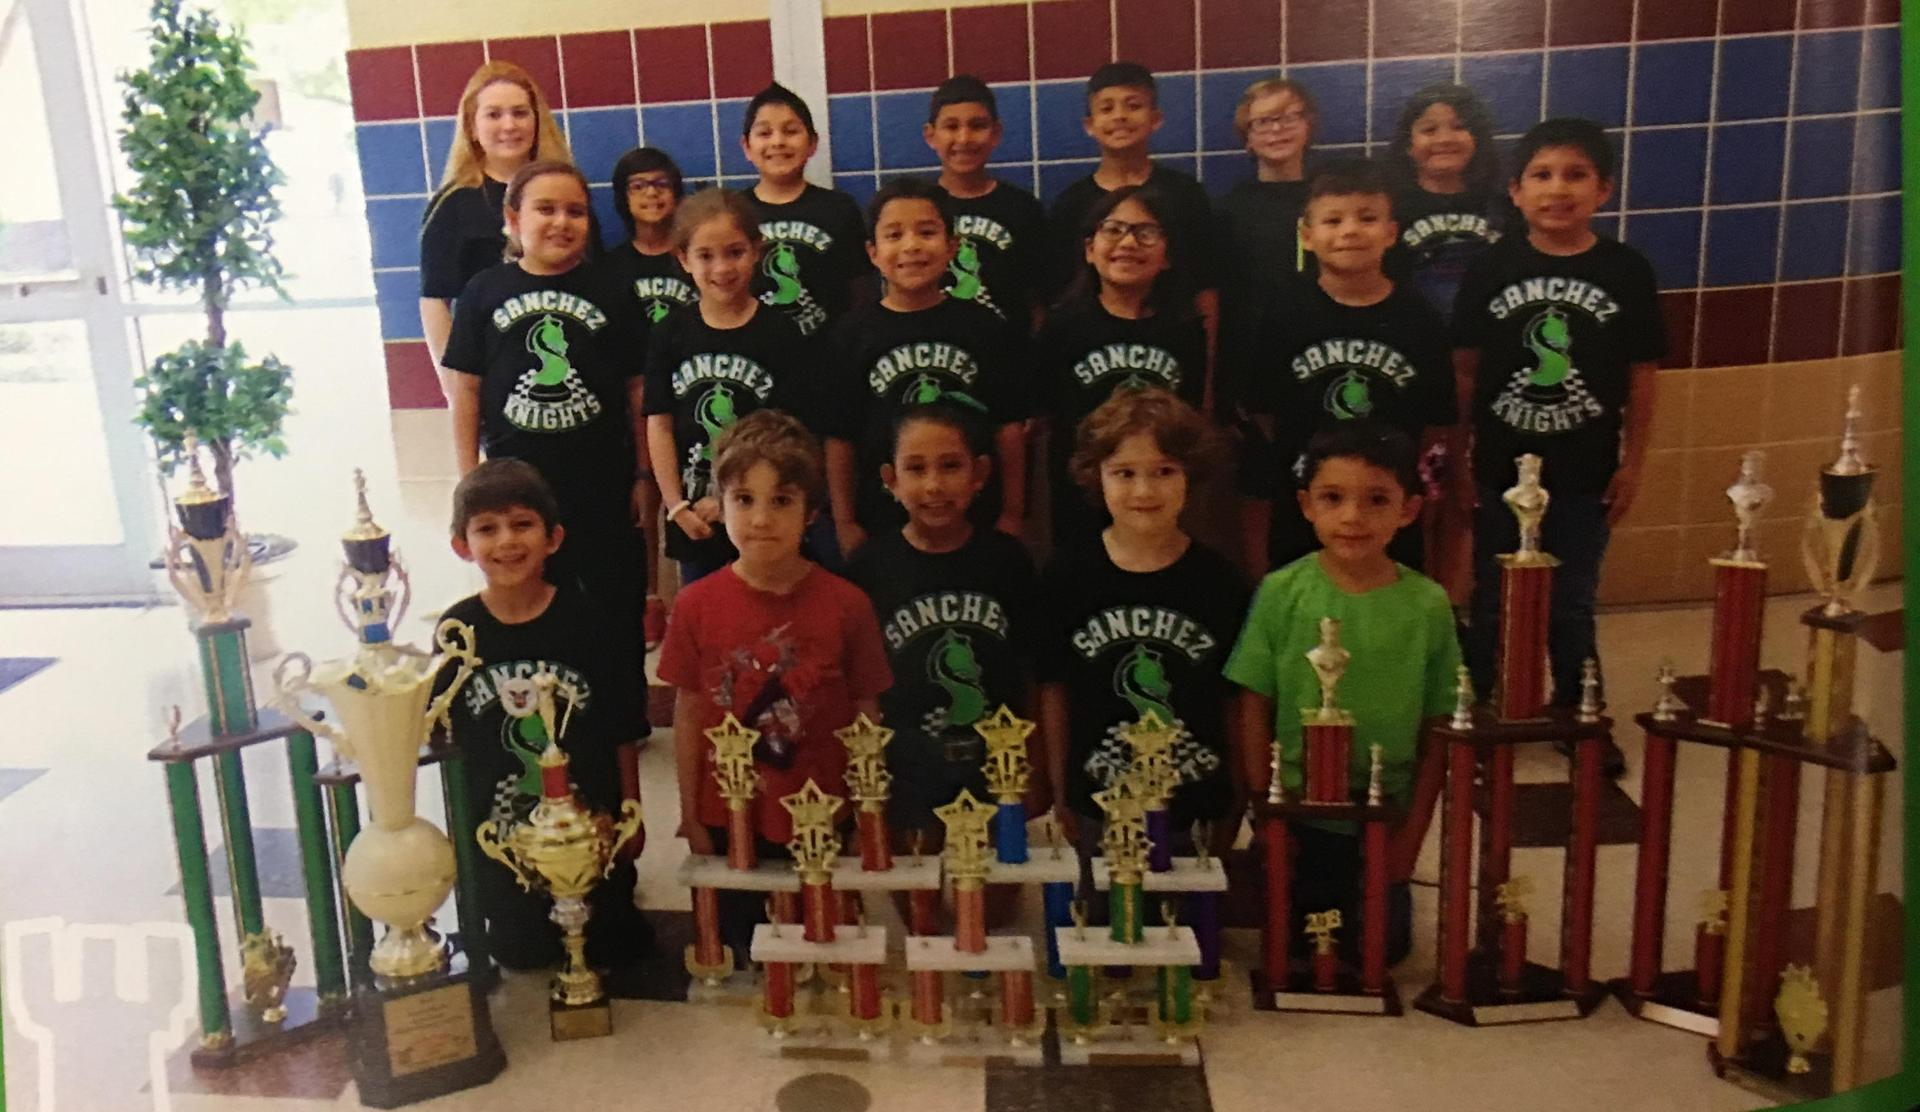 Sanchez Chess Team